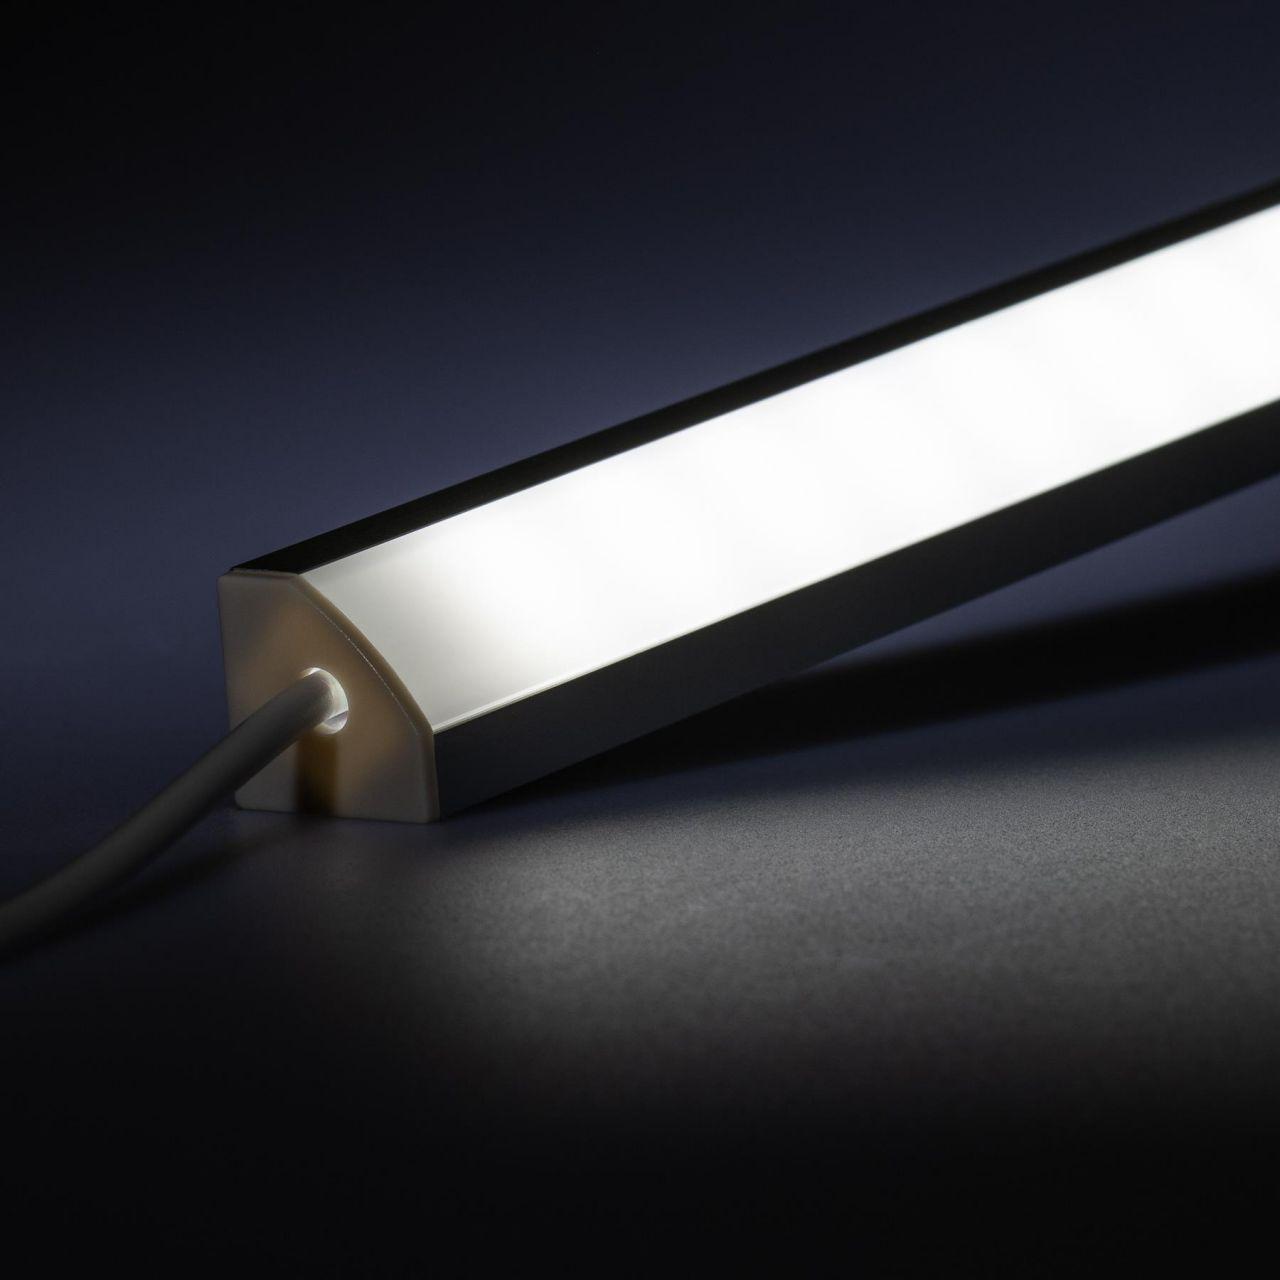 12V Aluminium LED Eckleiste – High Power - weiß – diffuse Abdeckung